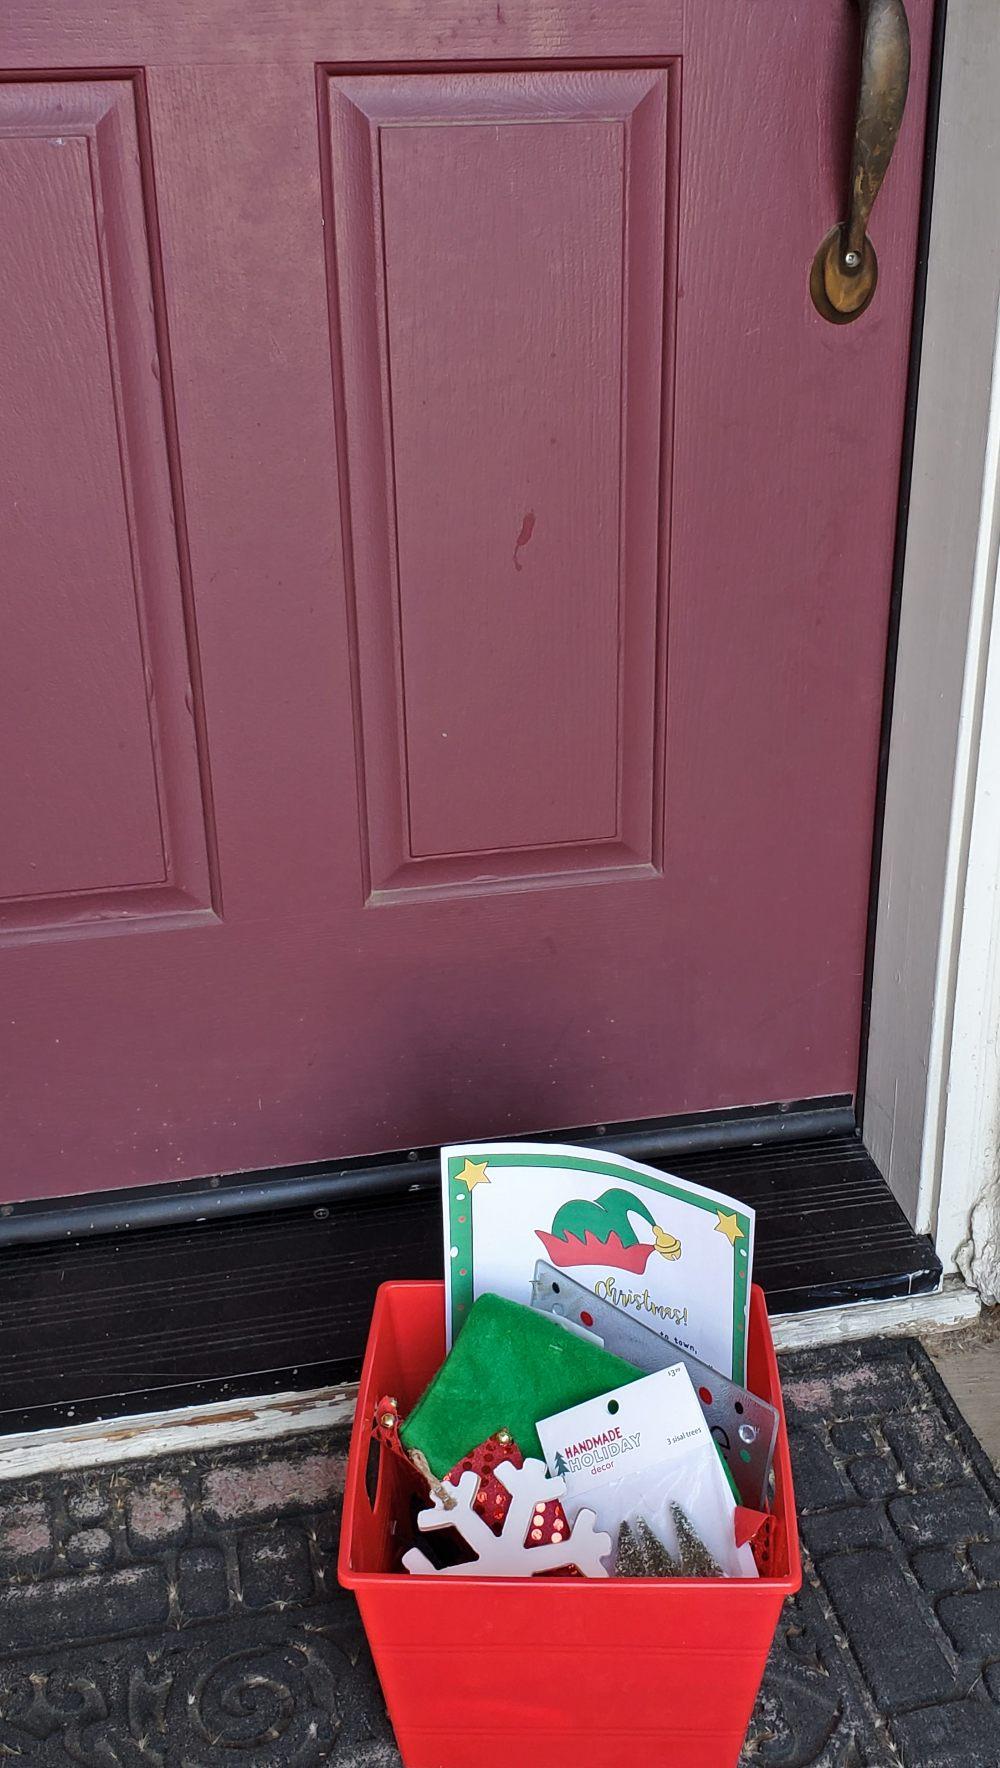 elfing your neighbors